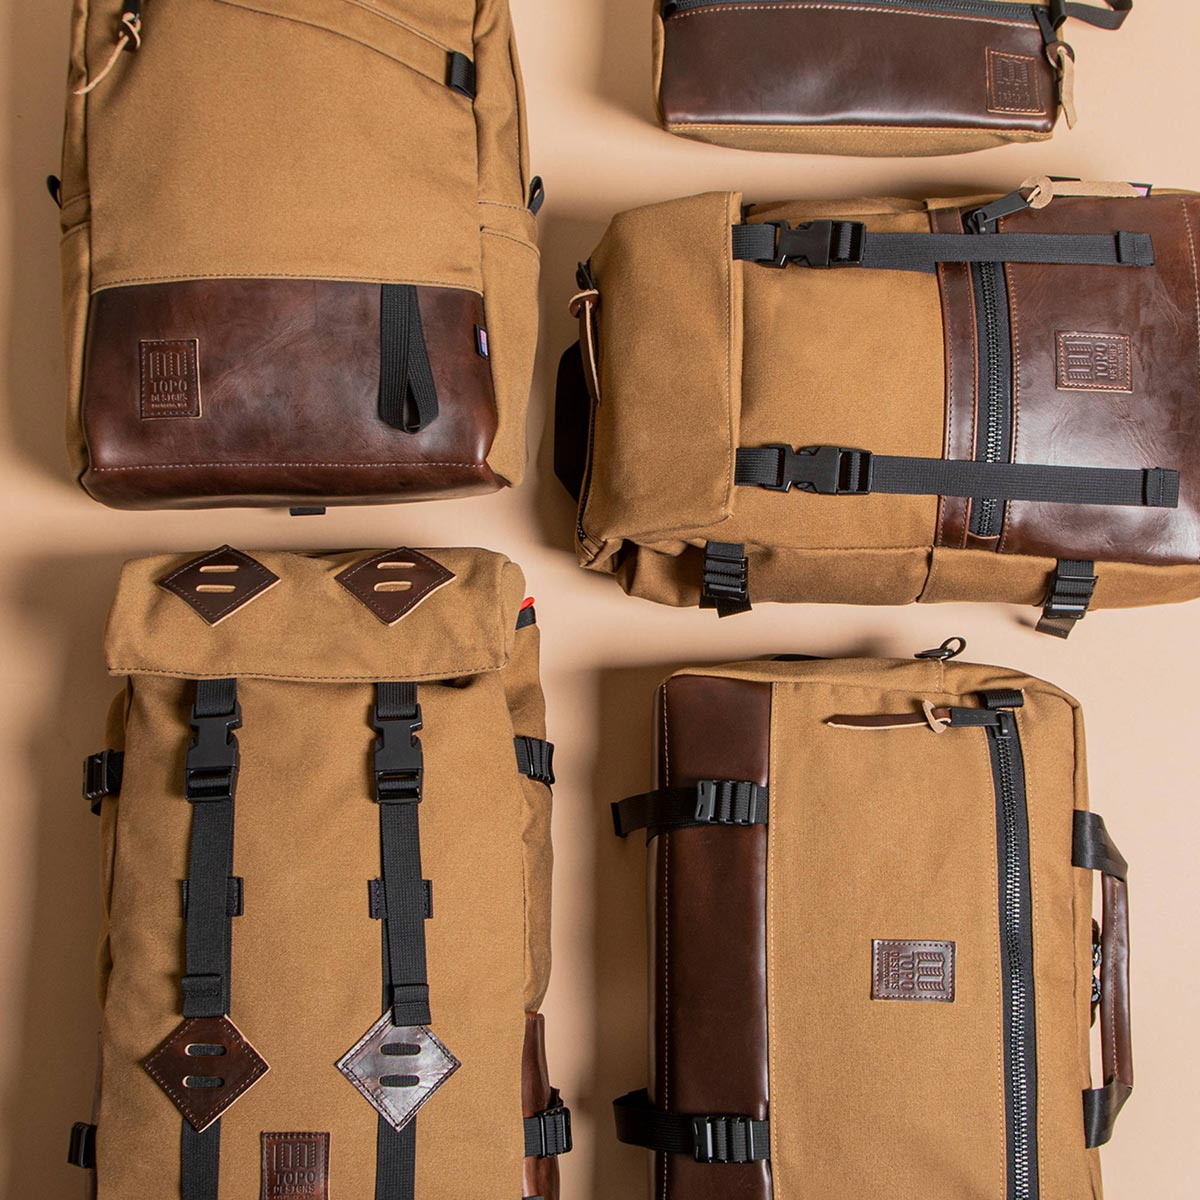 Topo Designs Klettersack Heritage Dark Khaki Canvas/Dark Brown Leather, beautiful backpack for men and women